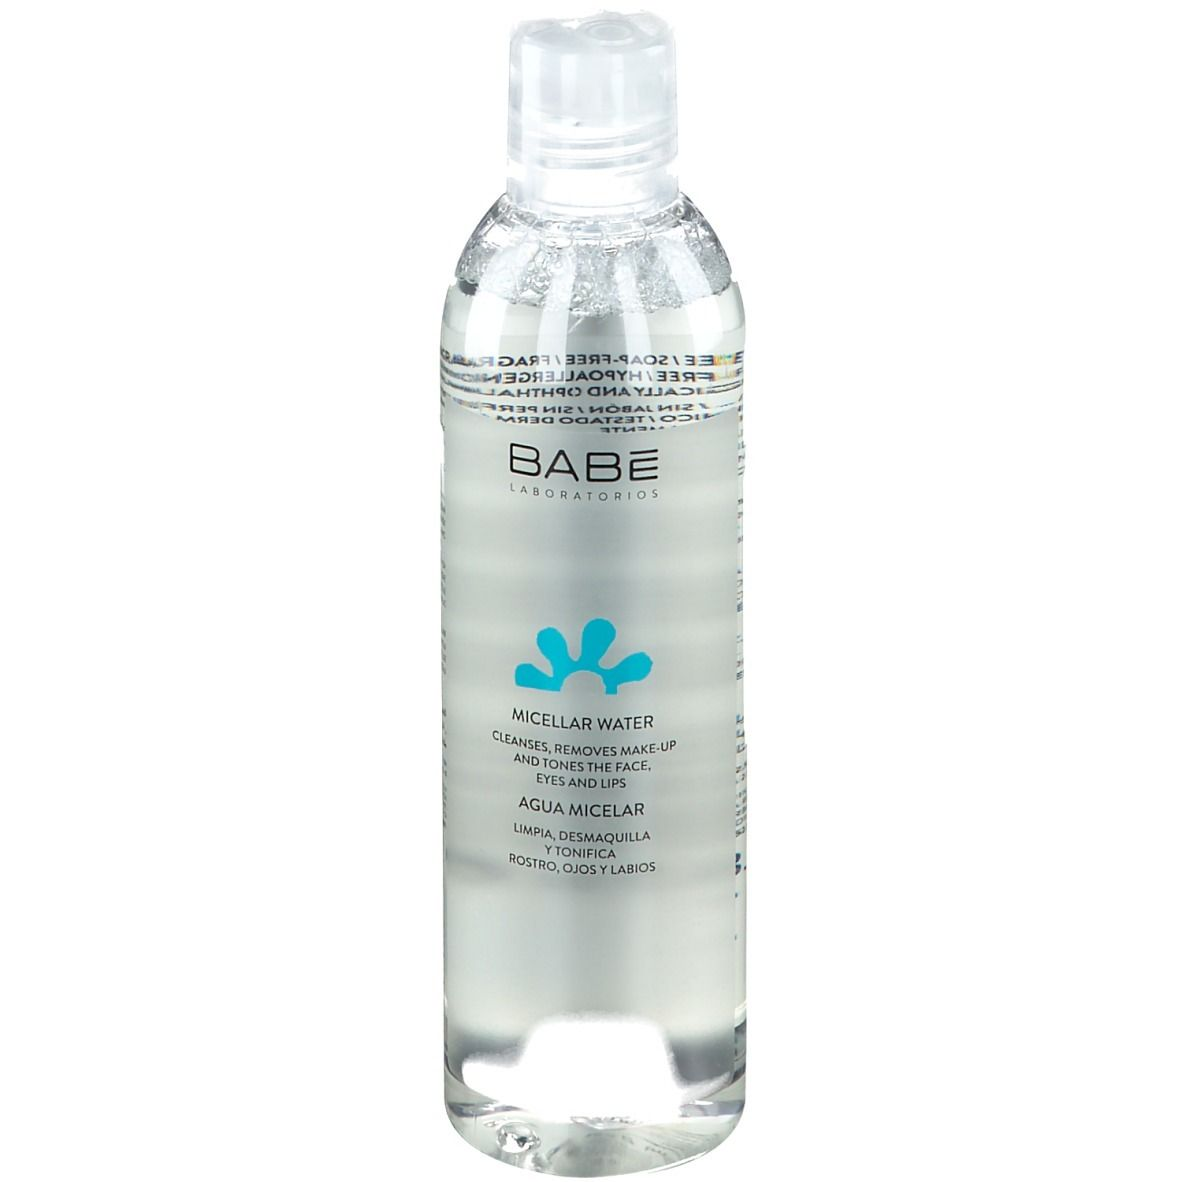 Image of BABÉ Micellar Wasser